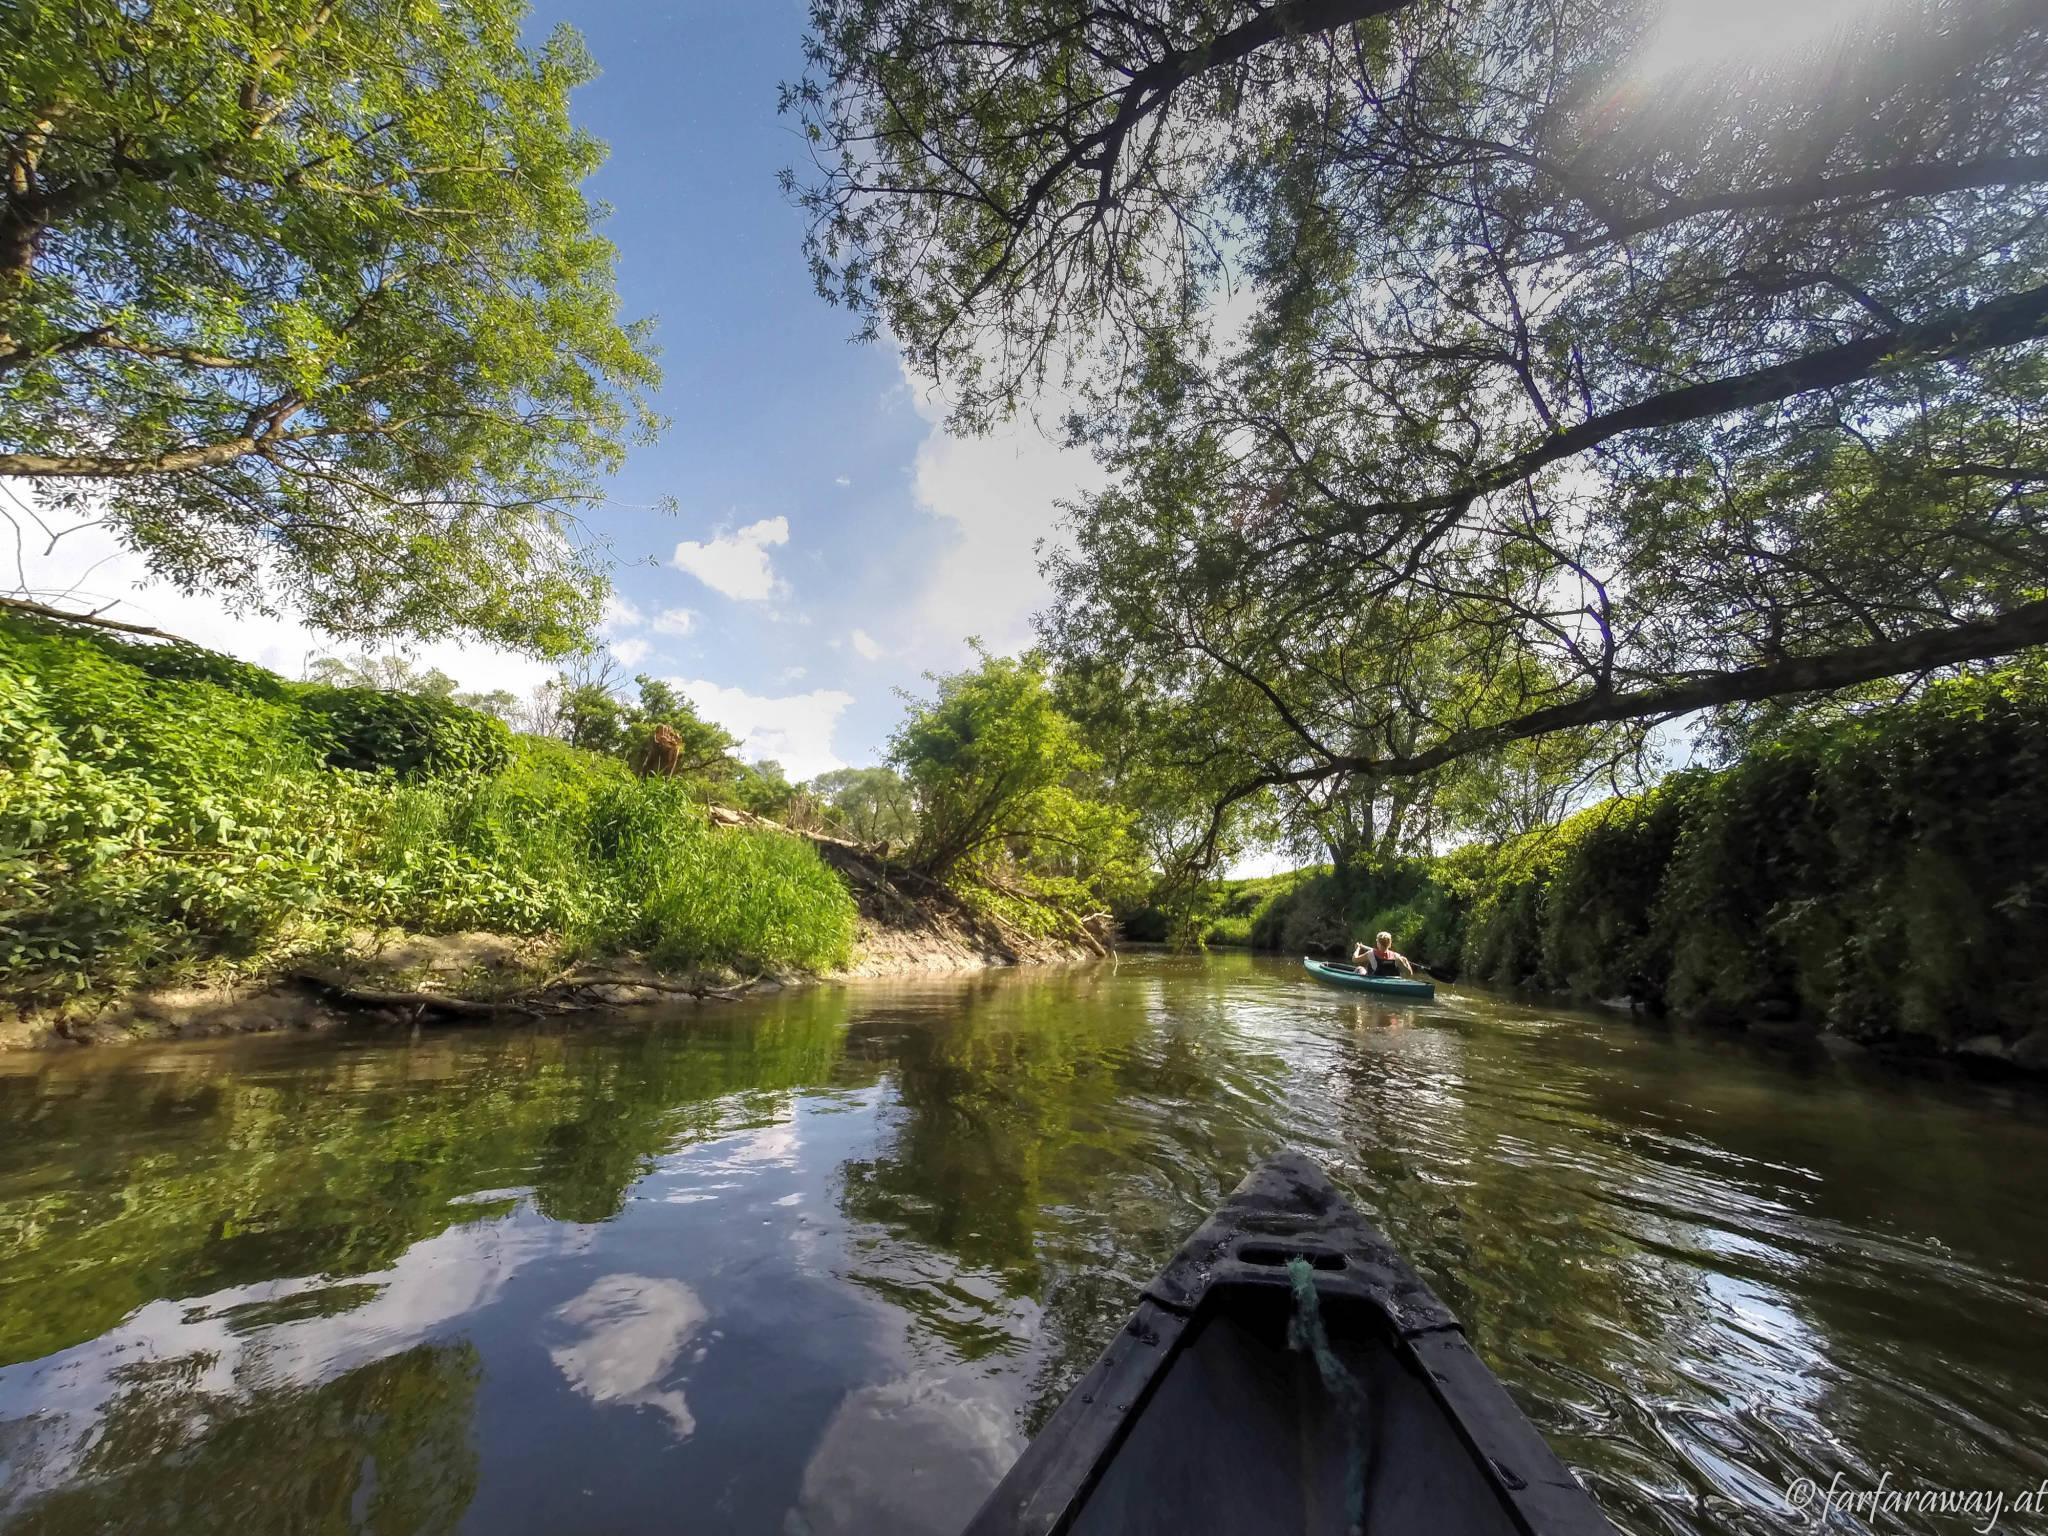 Immer hinter dem Kanu-Guide her